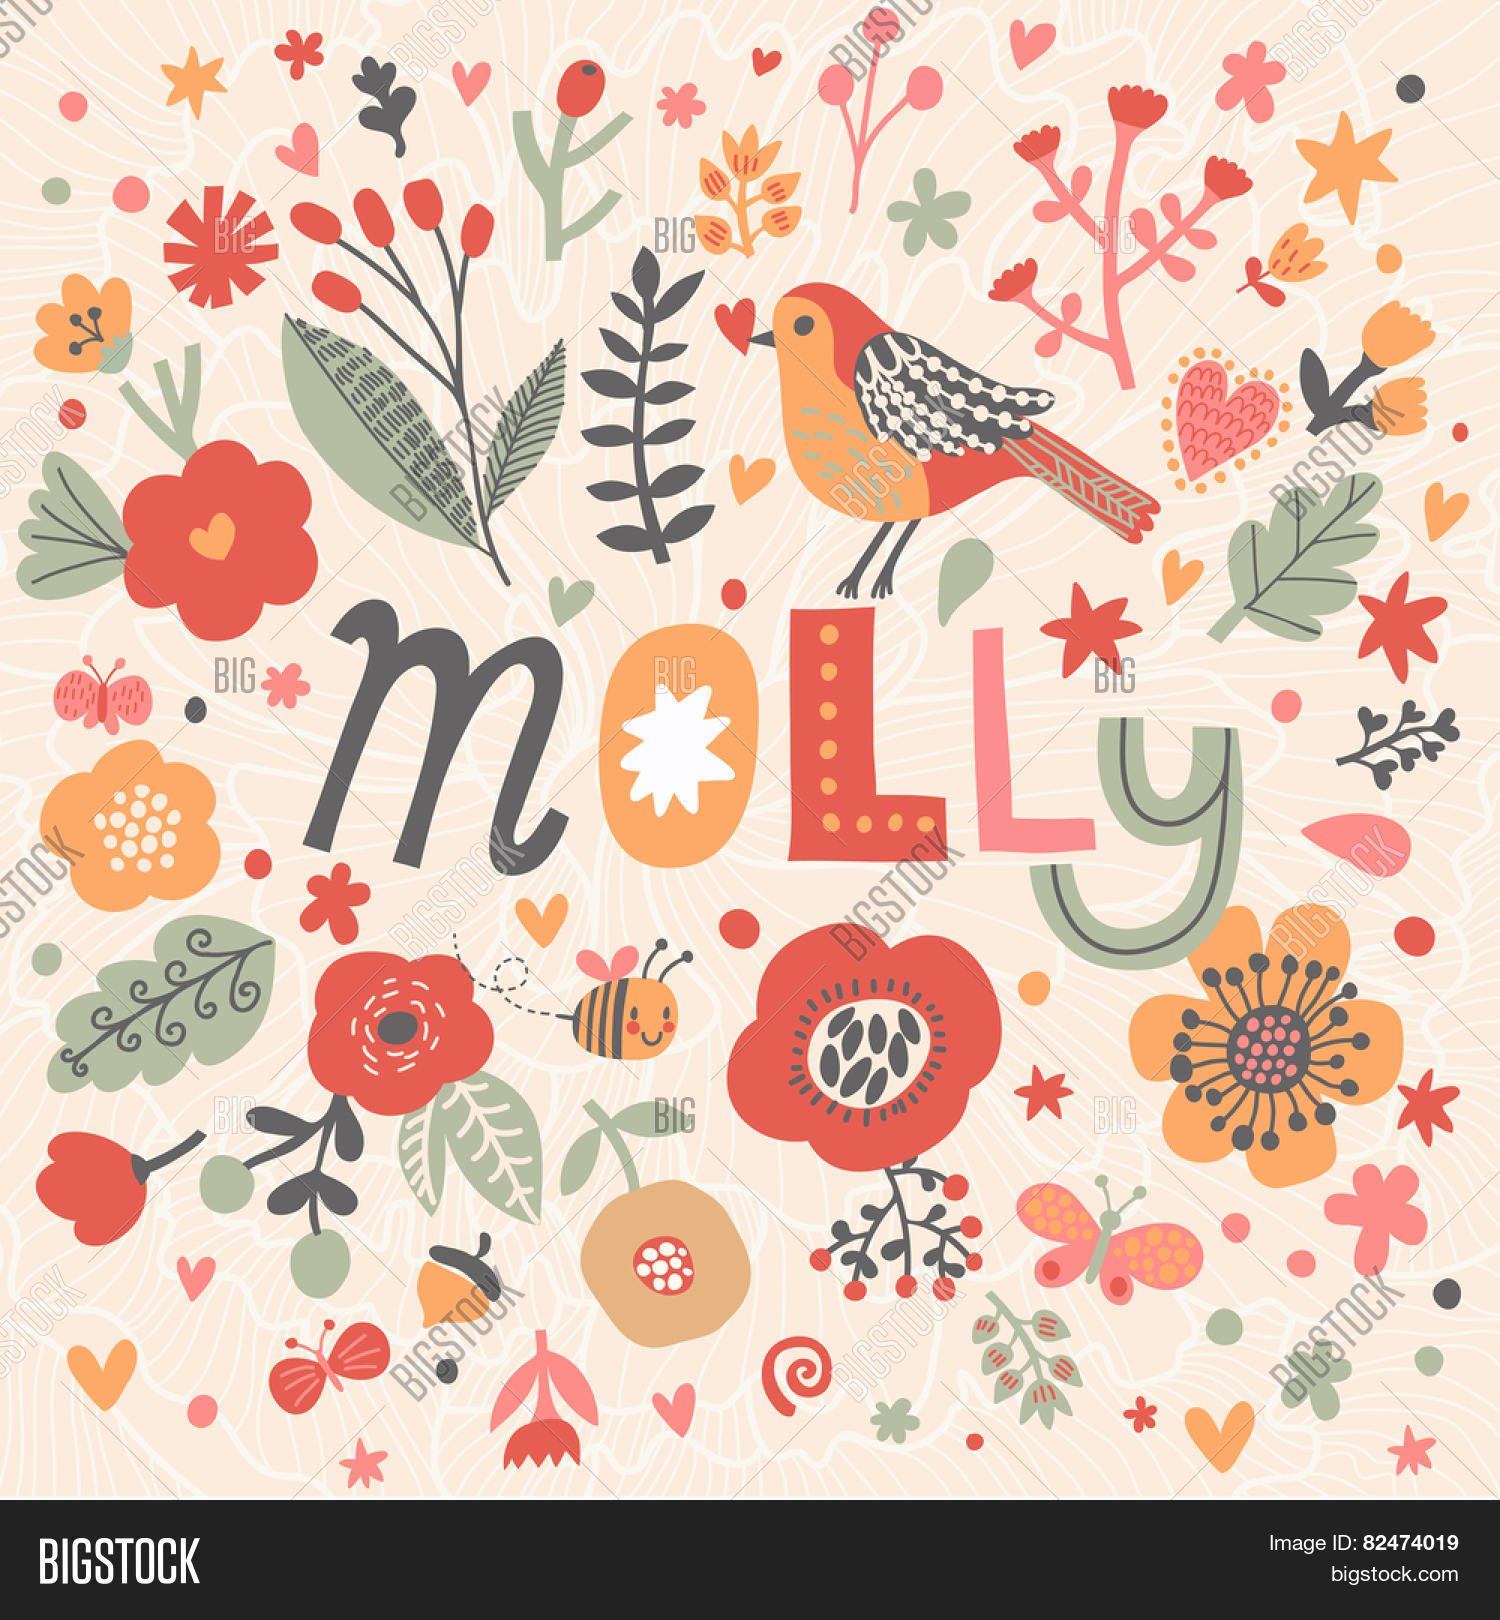 Flogging Molly Computer Wallpapers, Desktop Backgrounds | 1024x768 ...